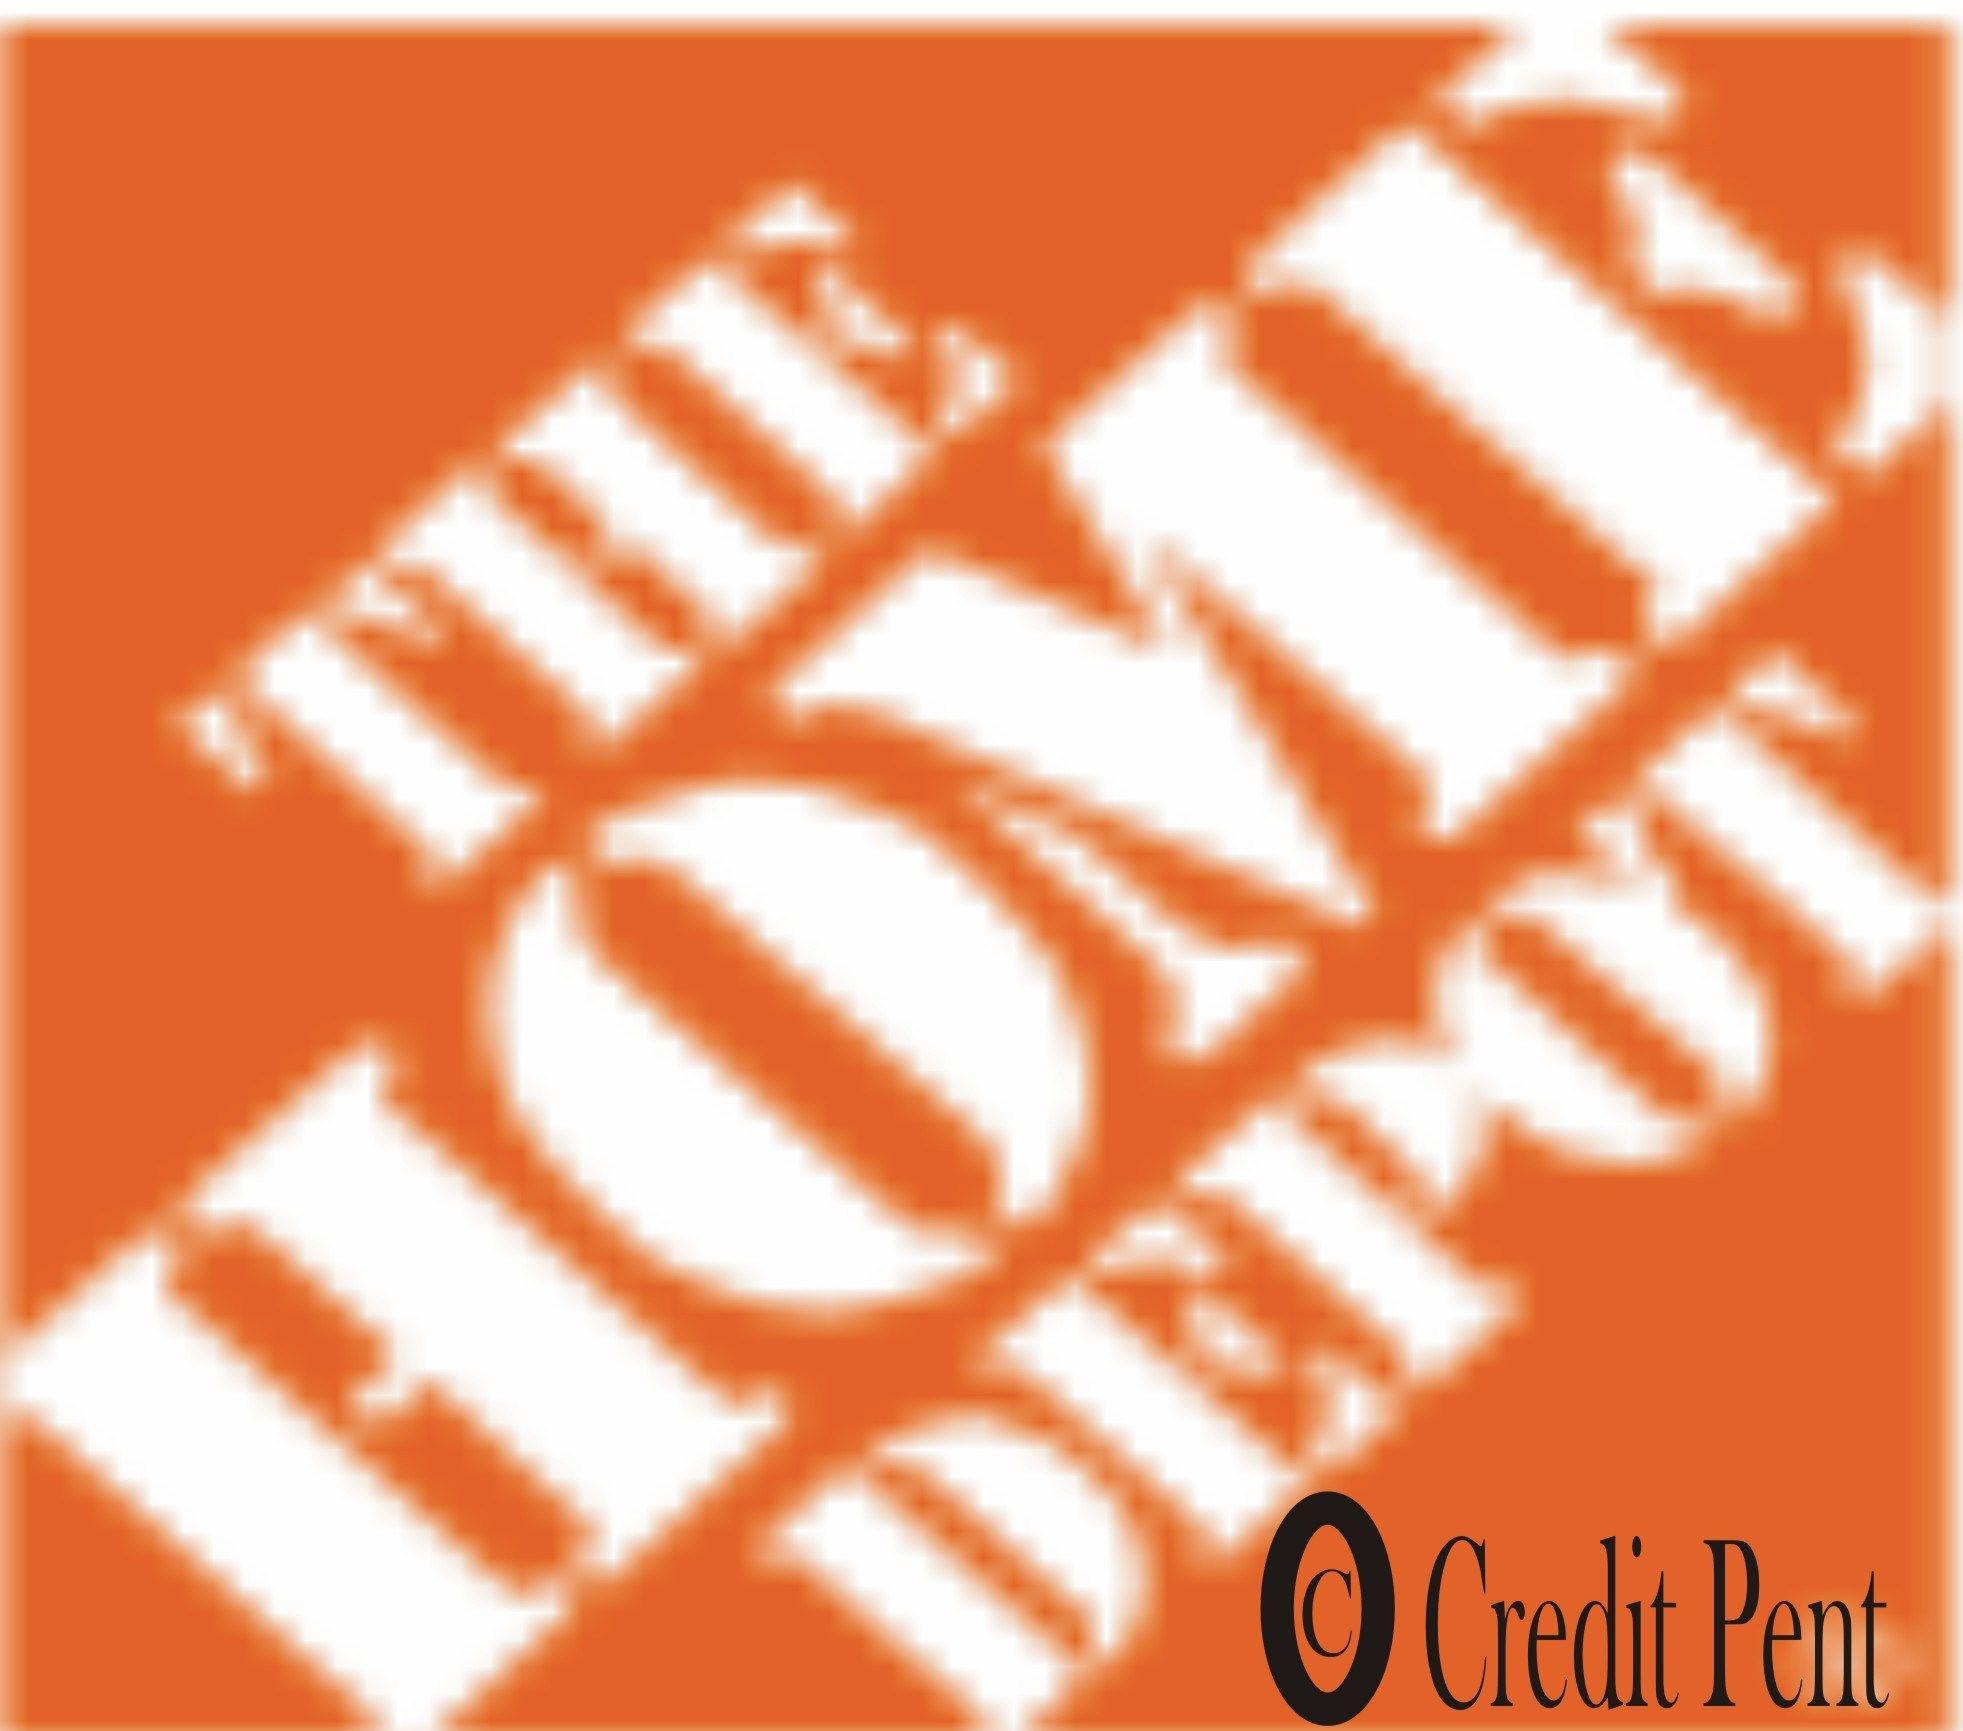 Home Depot Credit Card Login Home depot credit, Home